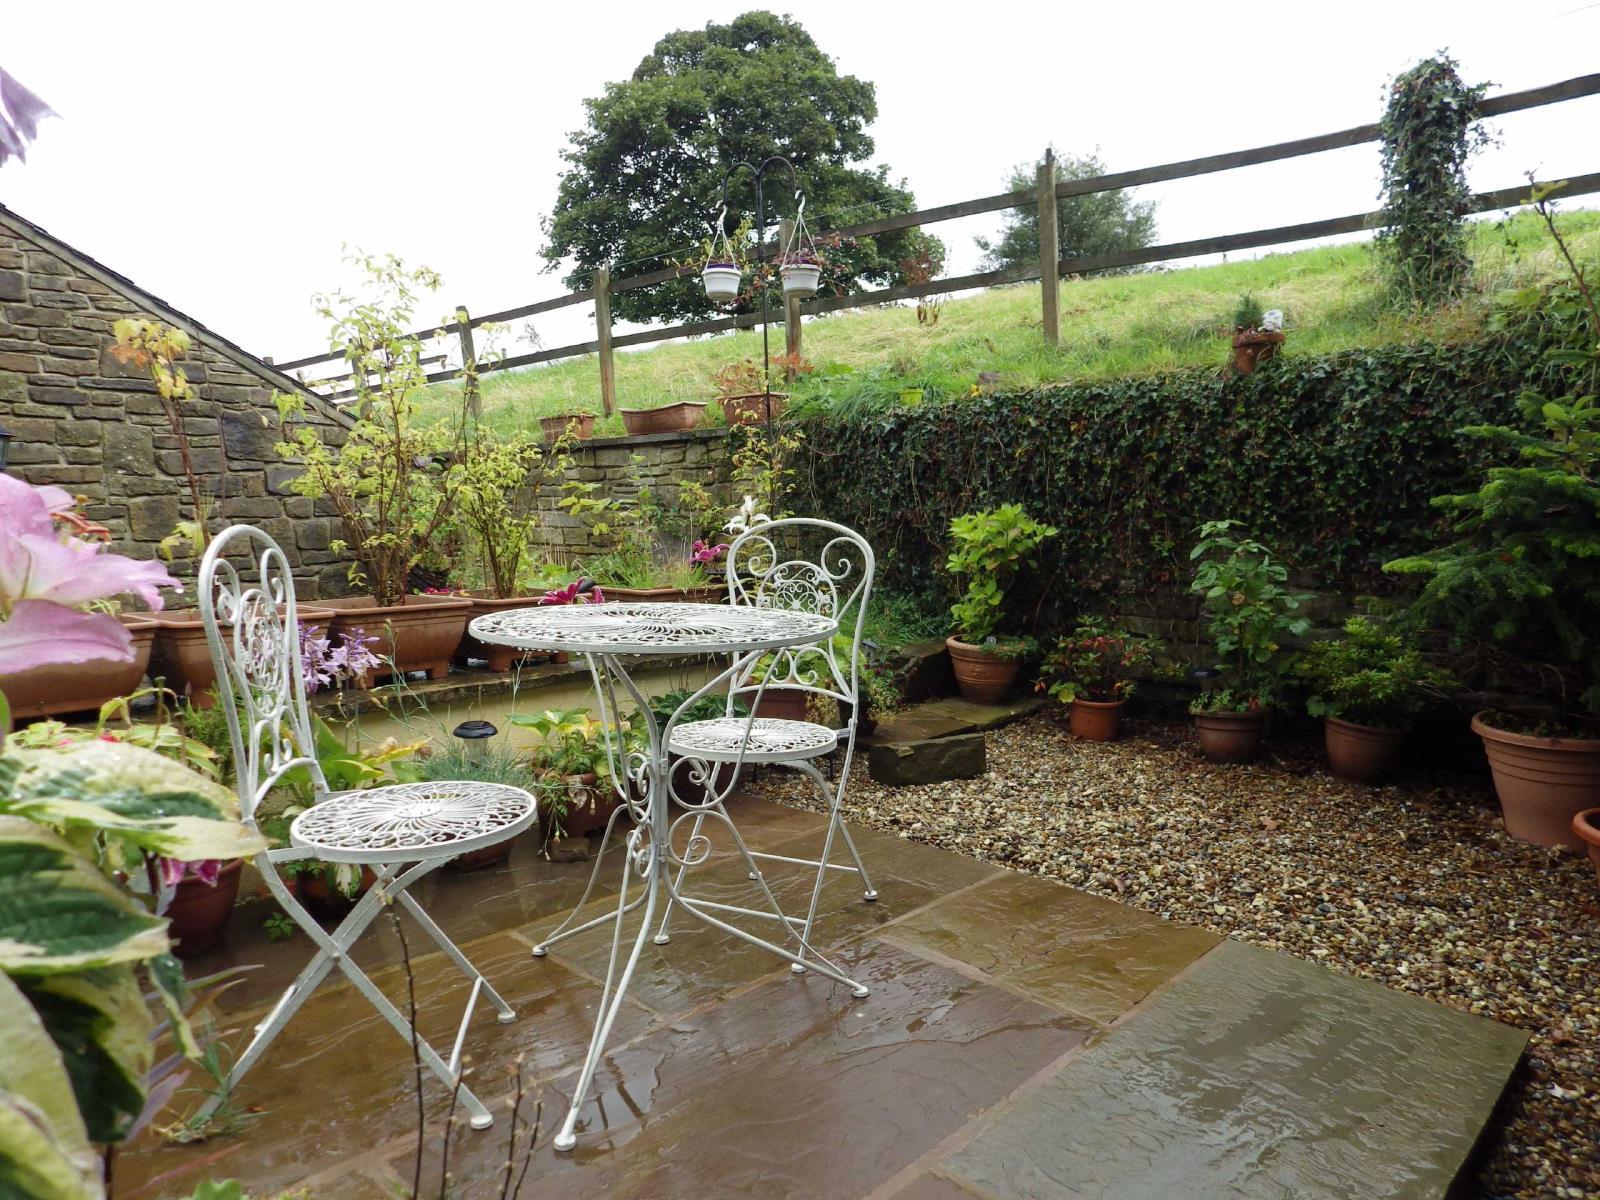 3 Bedrooms Terraced House for sale in Edgeside Lane, Waterfoot, Rossendale, Lancashire, BB4